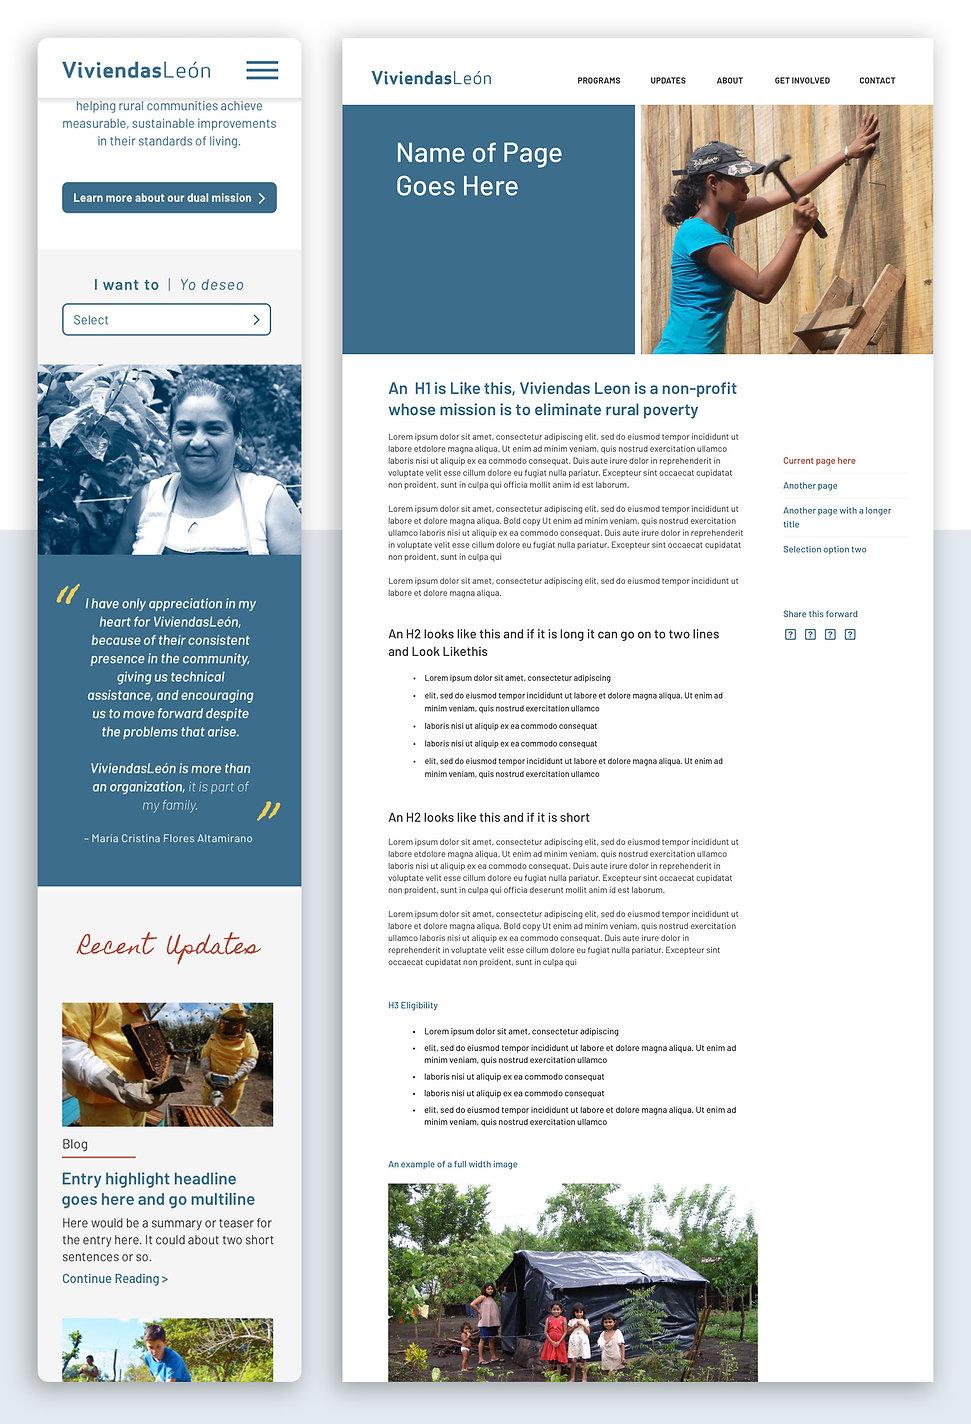 VL-web site-presentmobile.jpg